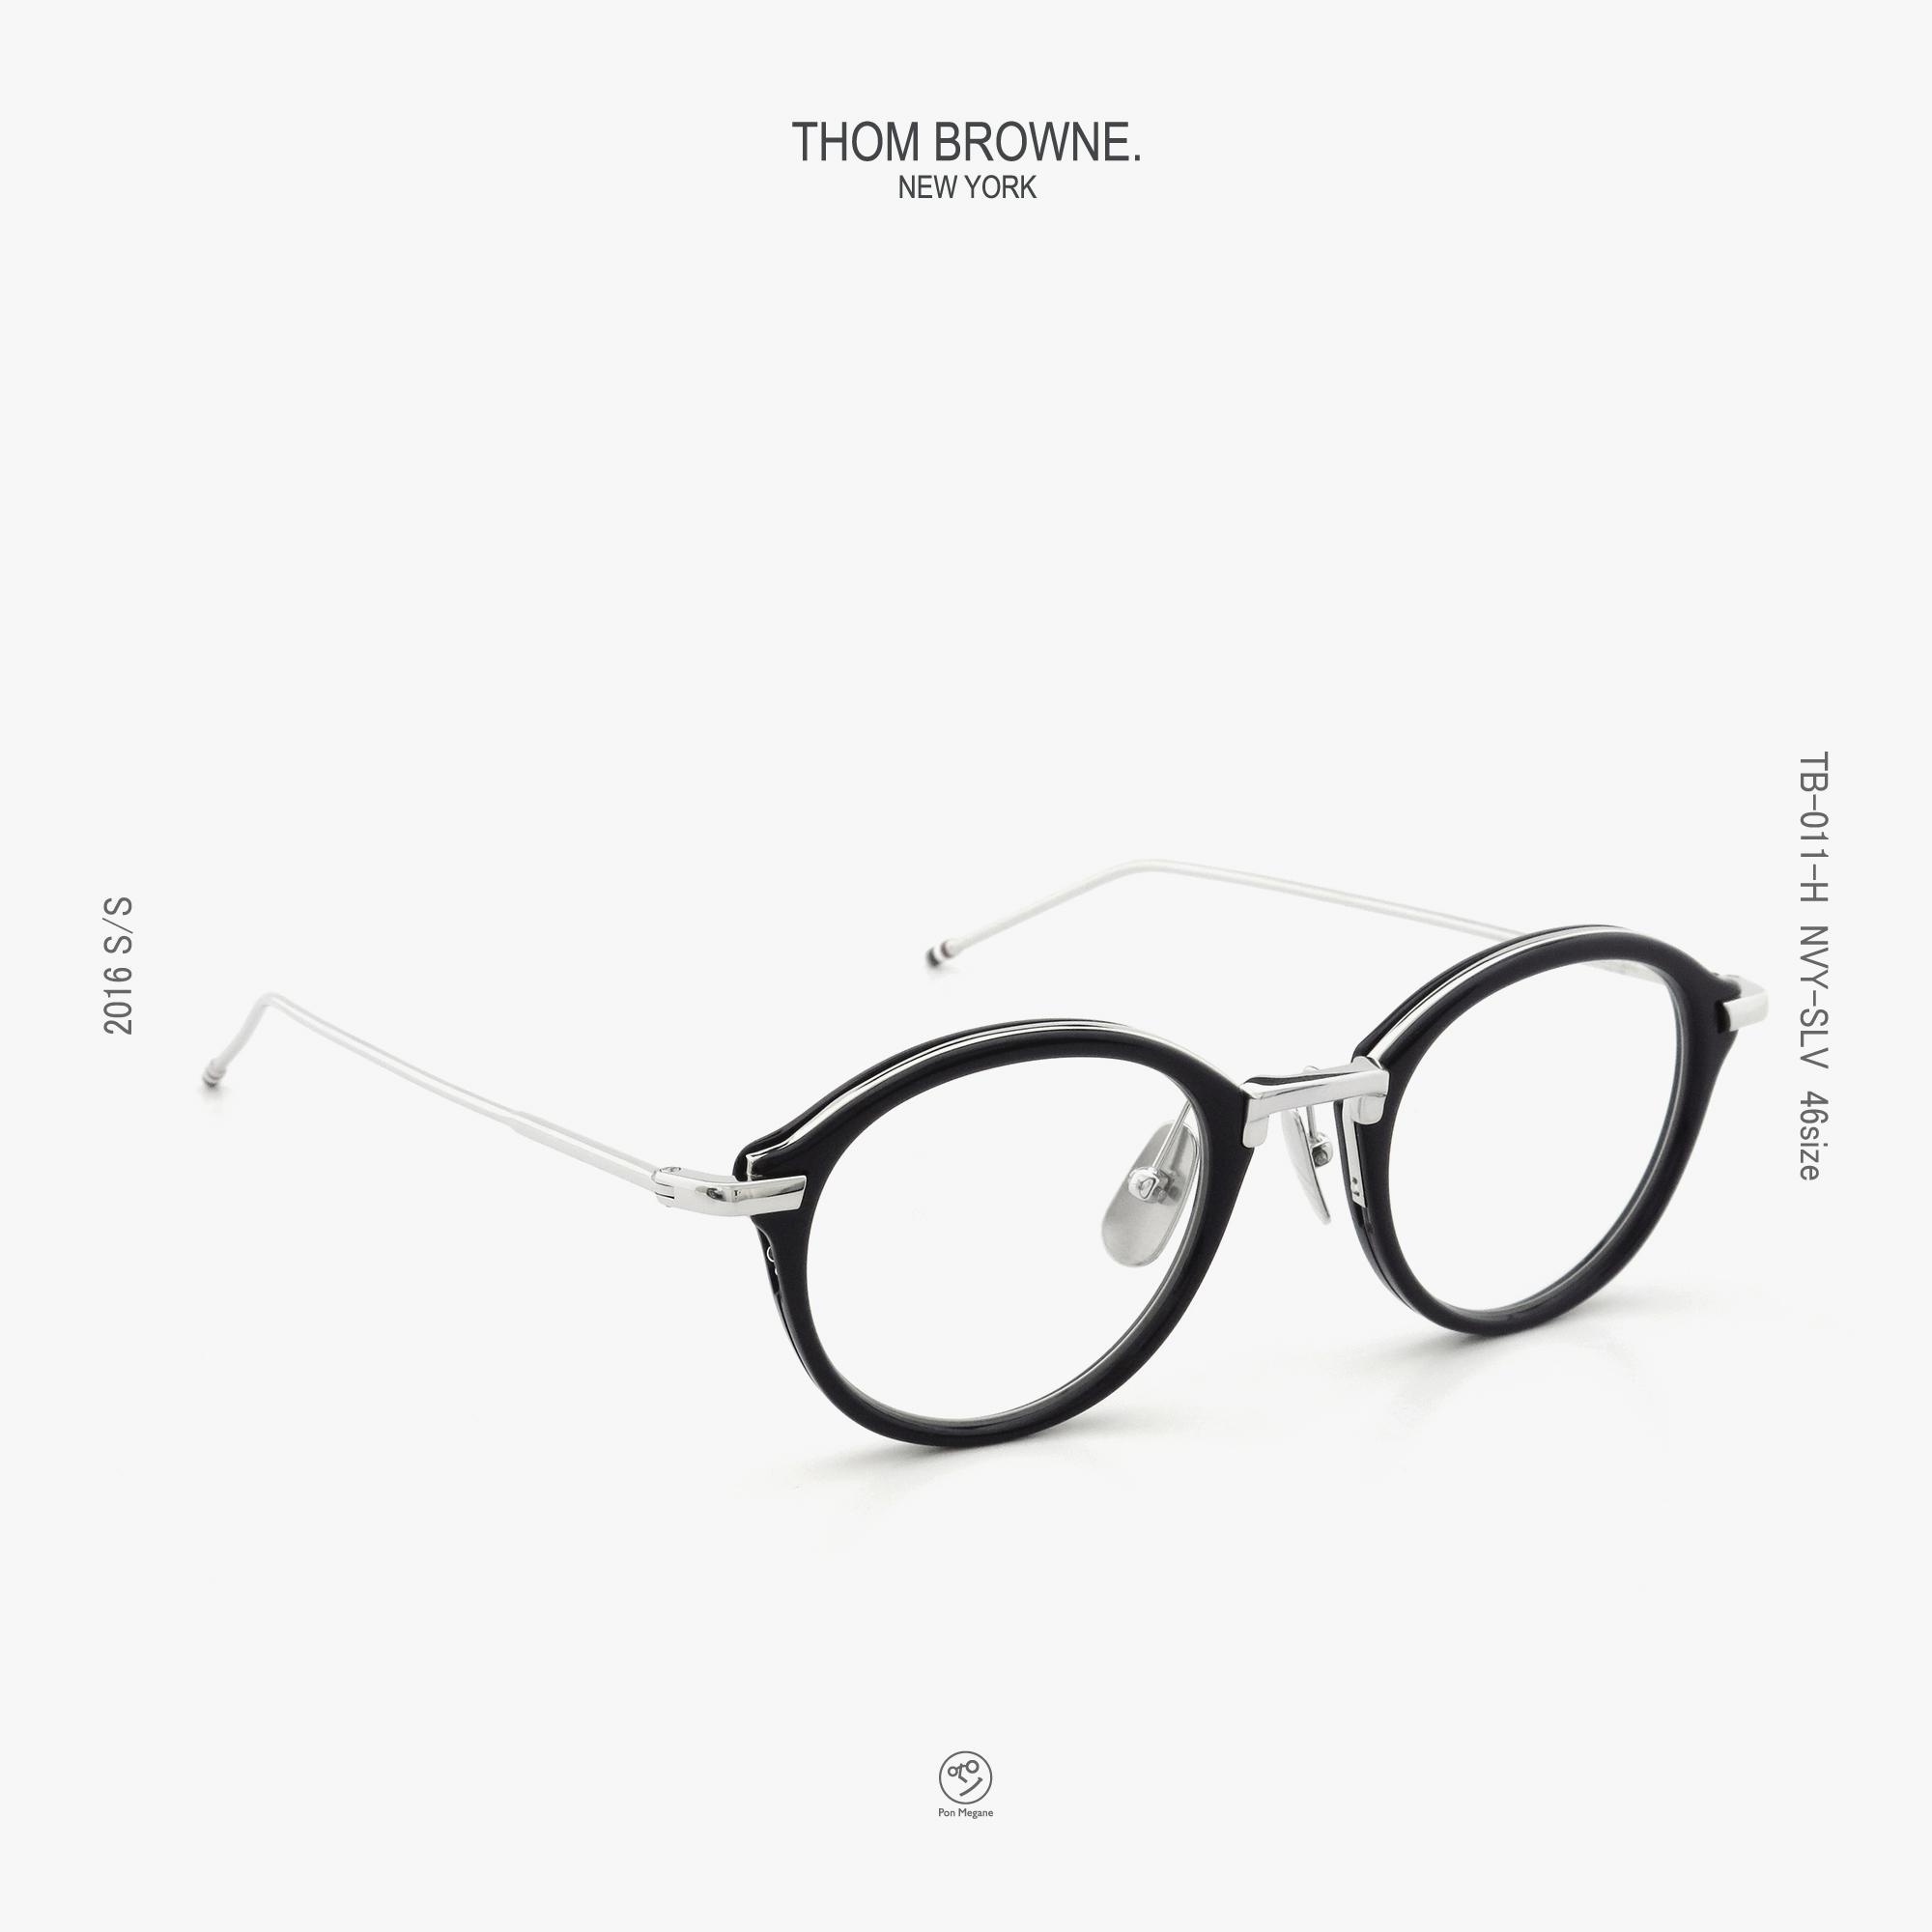 THOM-BROWNE_TB-011-H_NVY-SLV_46_insta